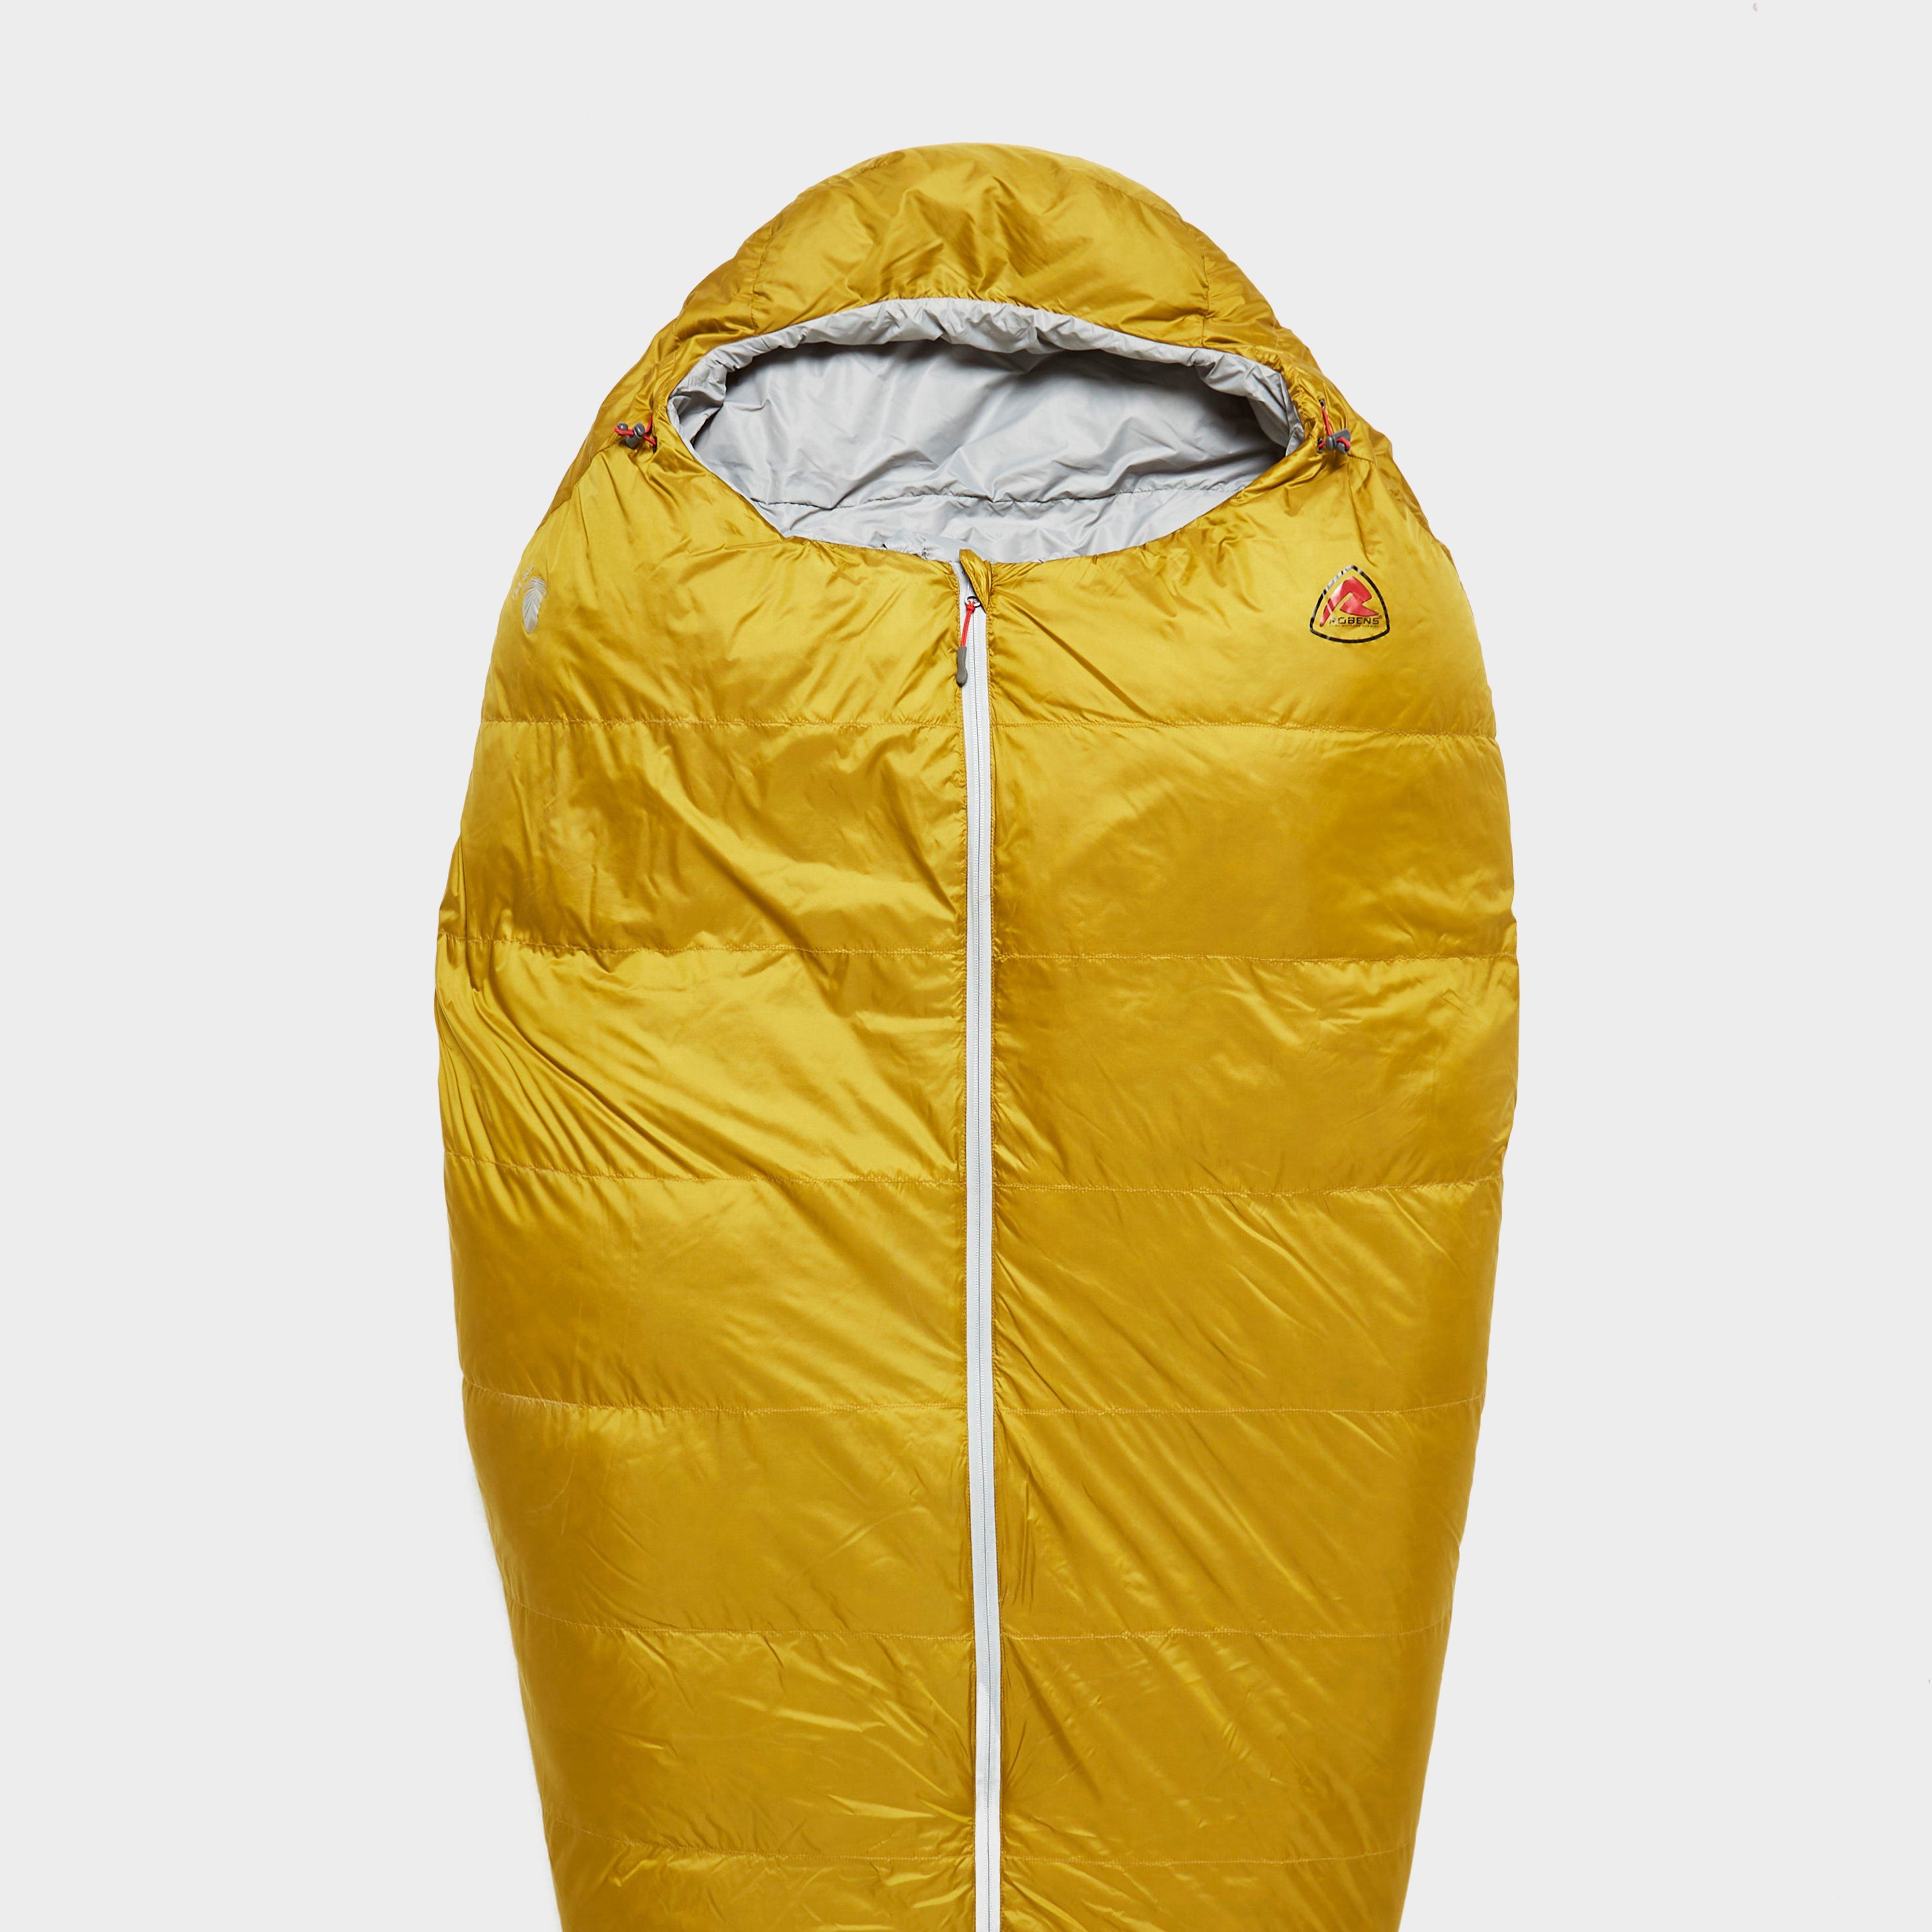 Robens Couloir 350 Sleeping Bag